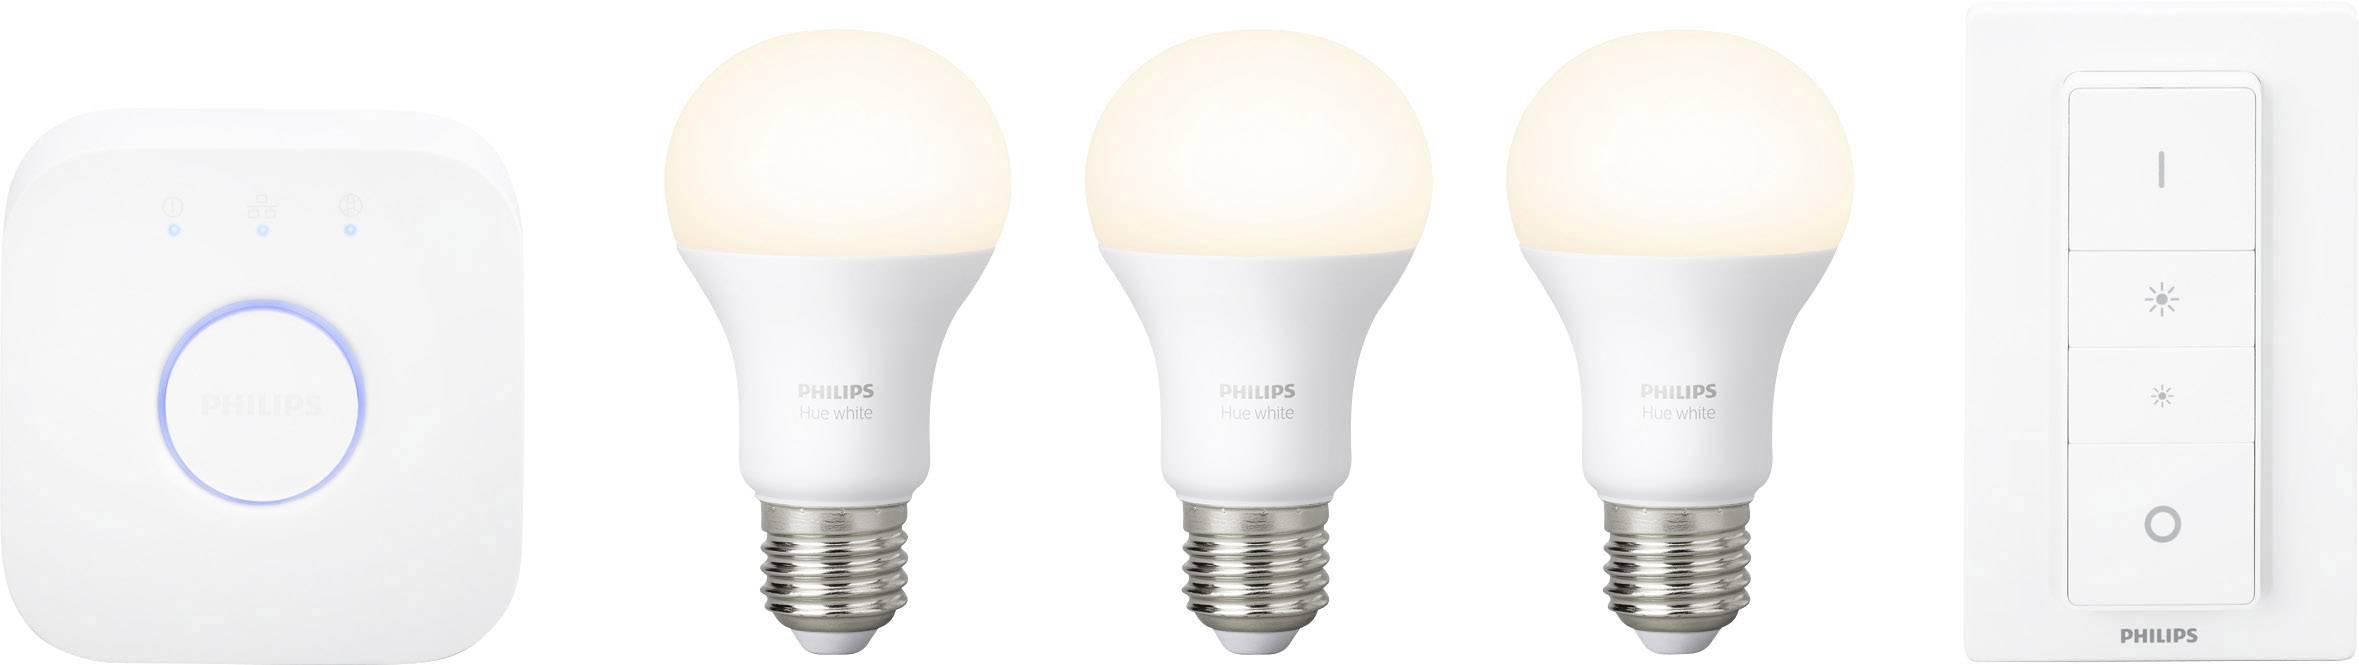 5473b0e64a6 Philips Lighting Hue Startpakke E27 9 W Varm hvid 3 stk ...